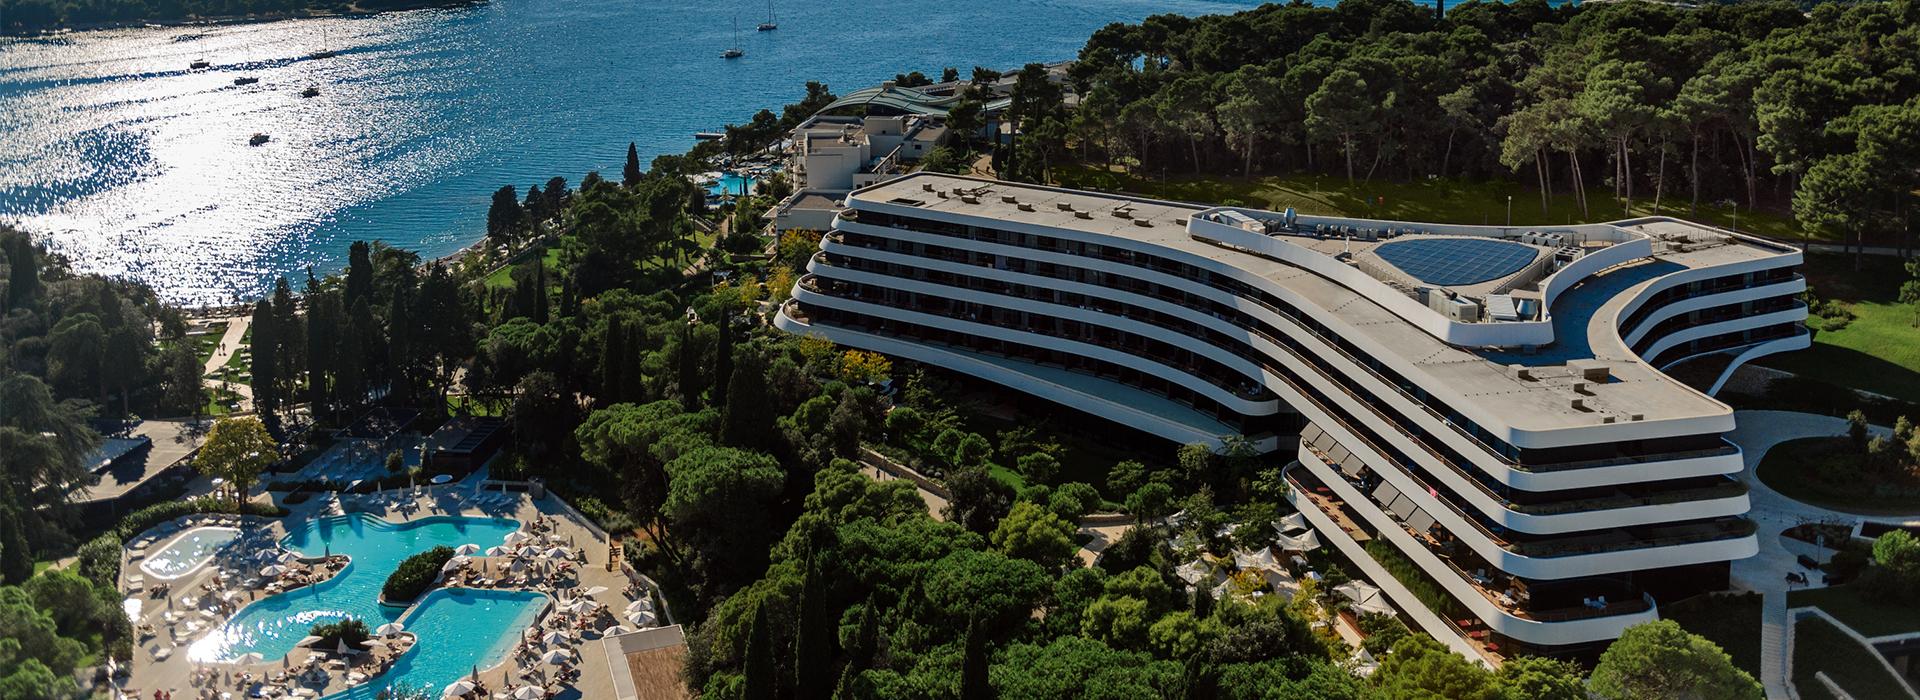 Villas Rubin Resort Rovinj Rovinj Chorwacja